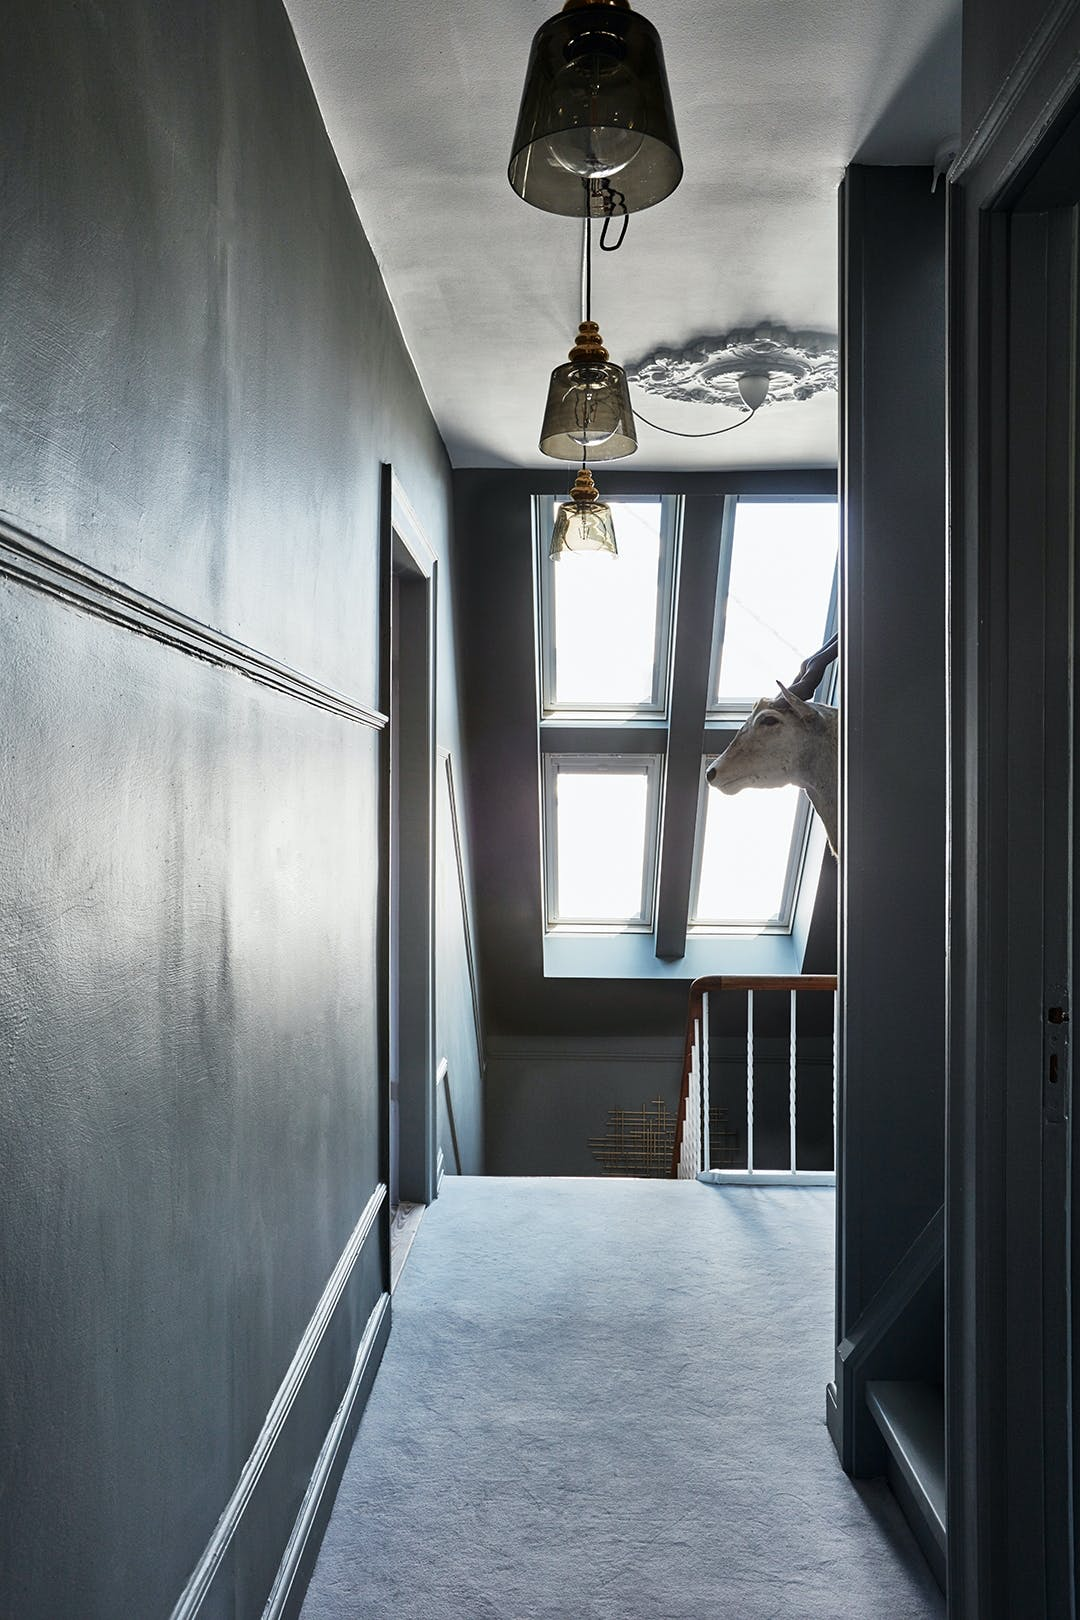 lysindfald væg-til-væg tæpper loftslamper Geranium